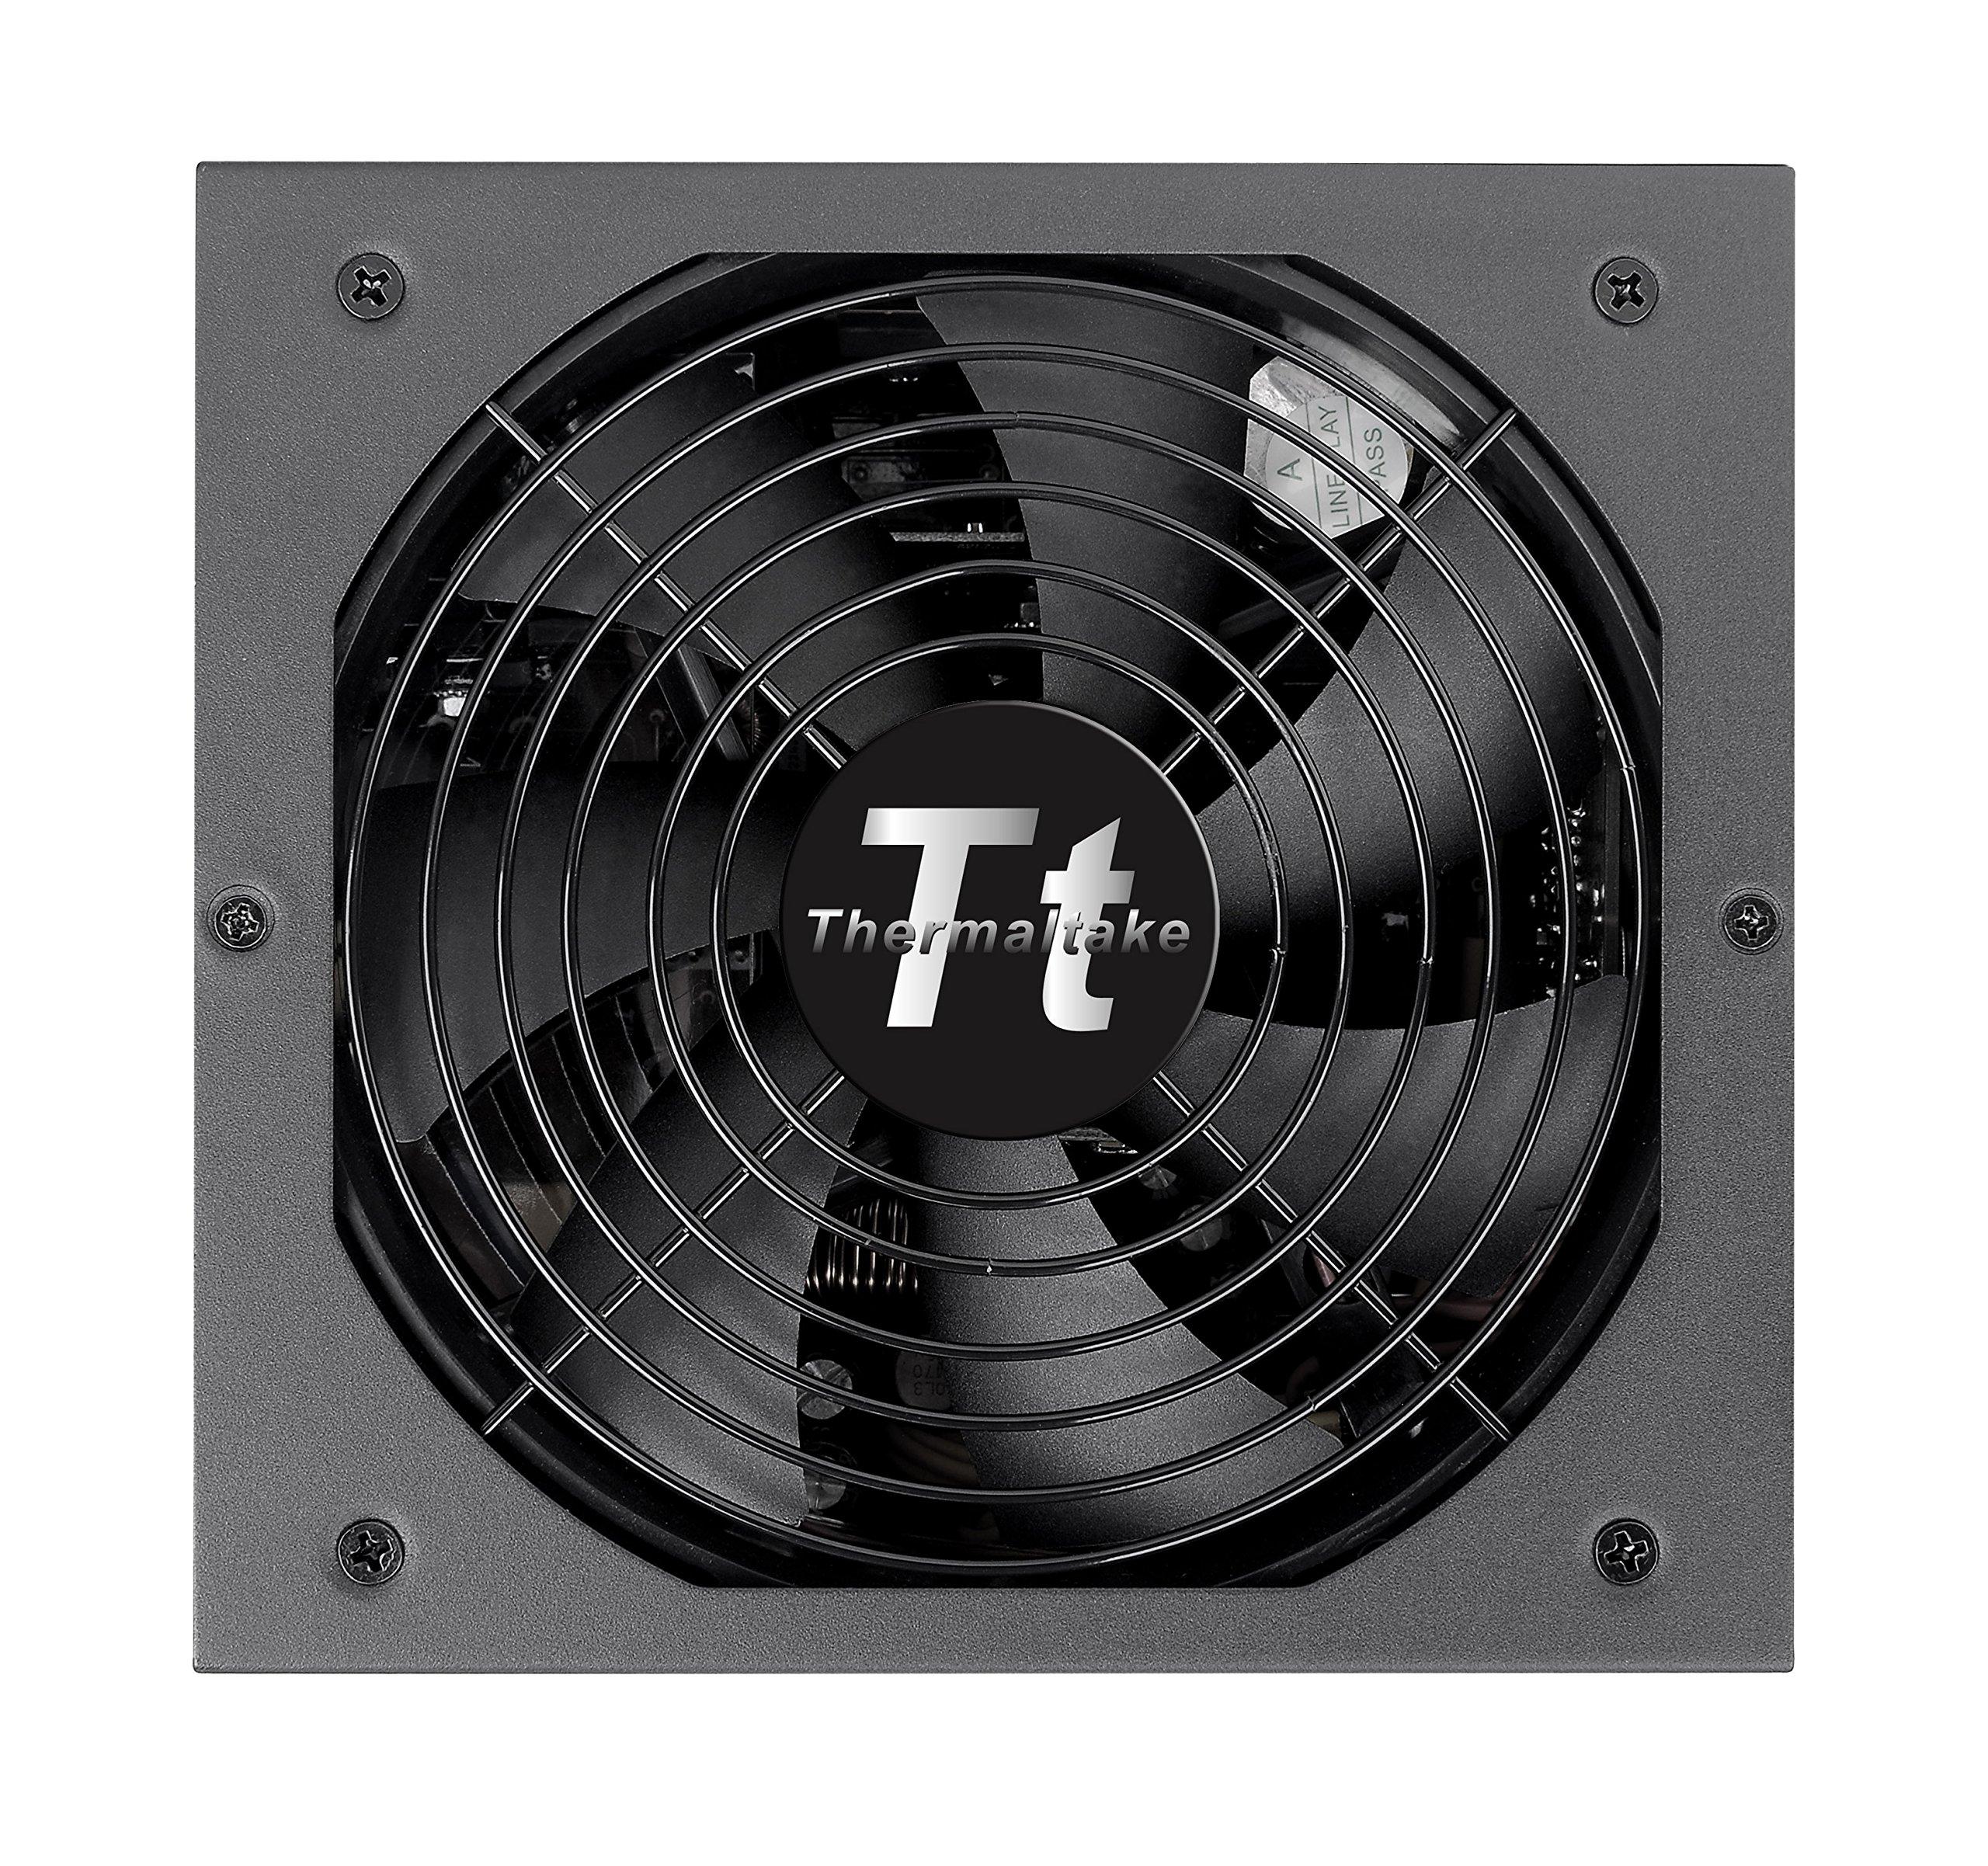 Thermaltake Smart Standard 750W 80 PLUS Bronze ATX12V 2.3 Power Supply SP-750P by Thermaltake (Image #3)